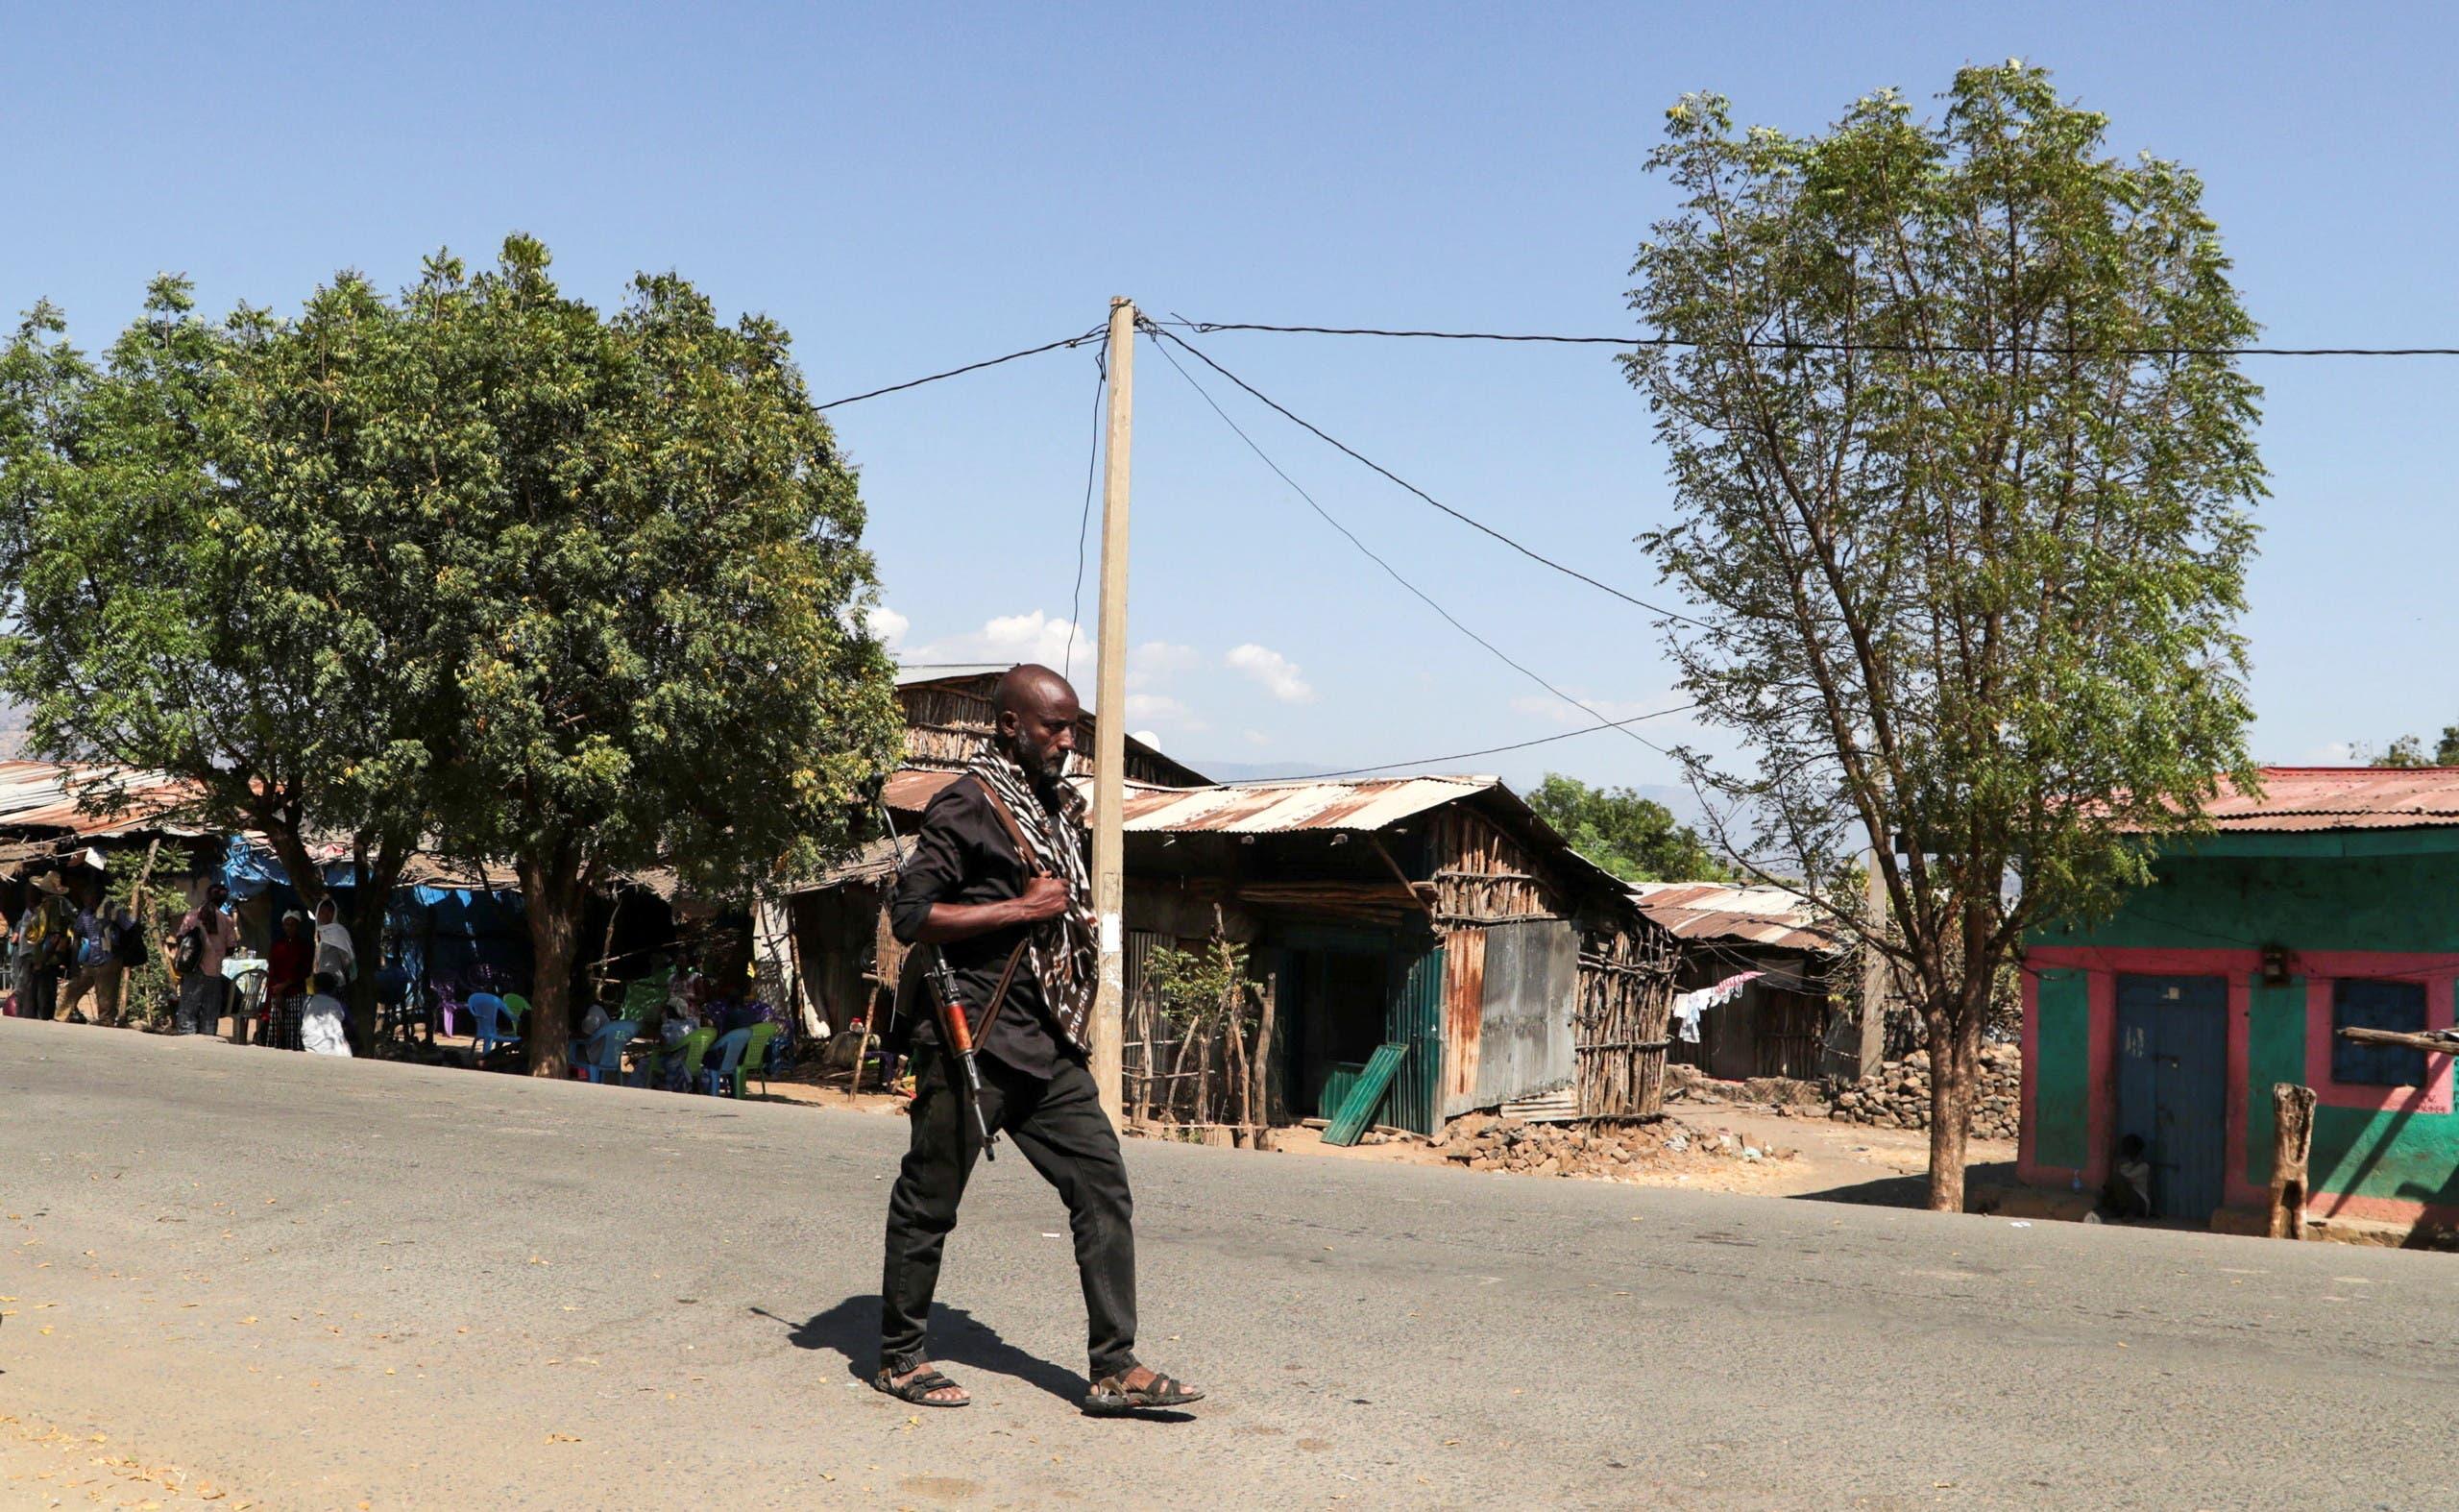 A member of the Amhara Special Force patrols a street in Soroka village in Amhara region near a border with Tigray, Ethiopia November 9, 2020. (File photo: Reuters)